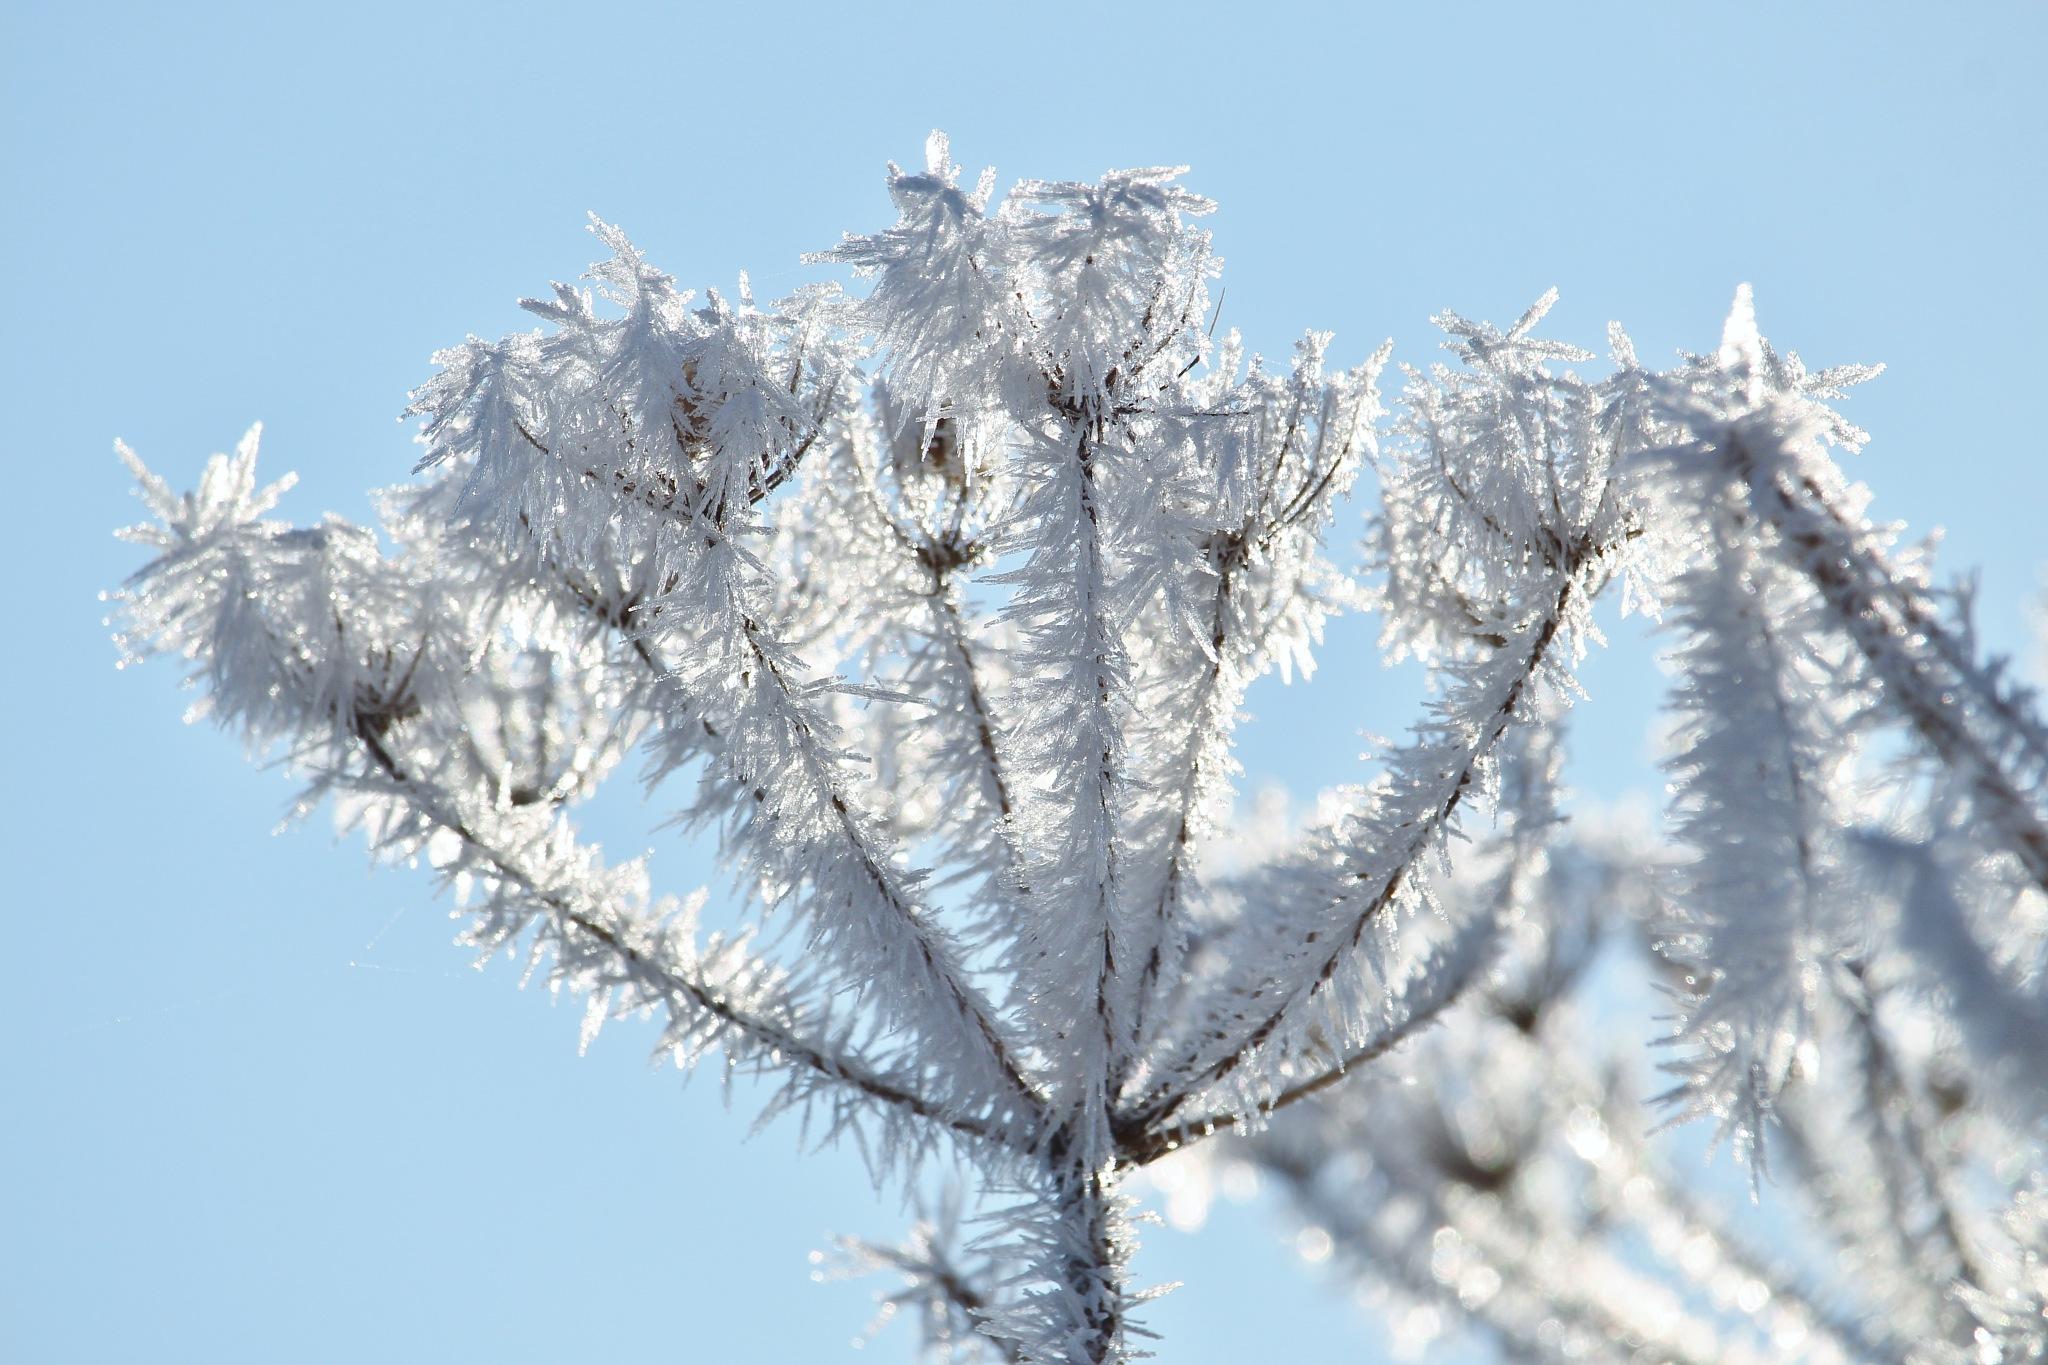 Winter by Evie Tinnevelt